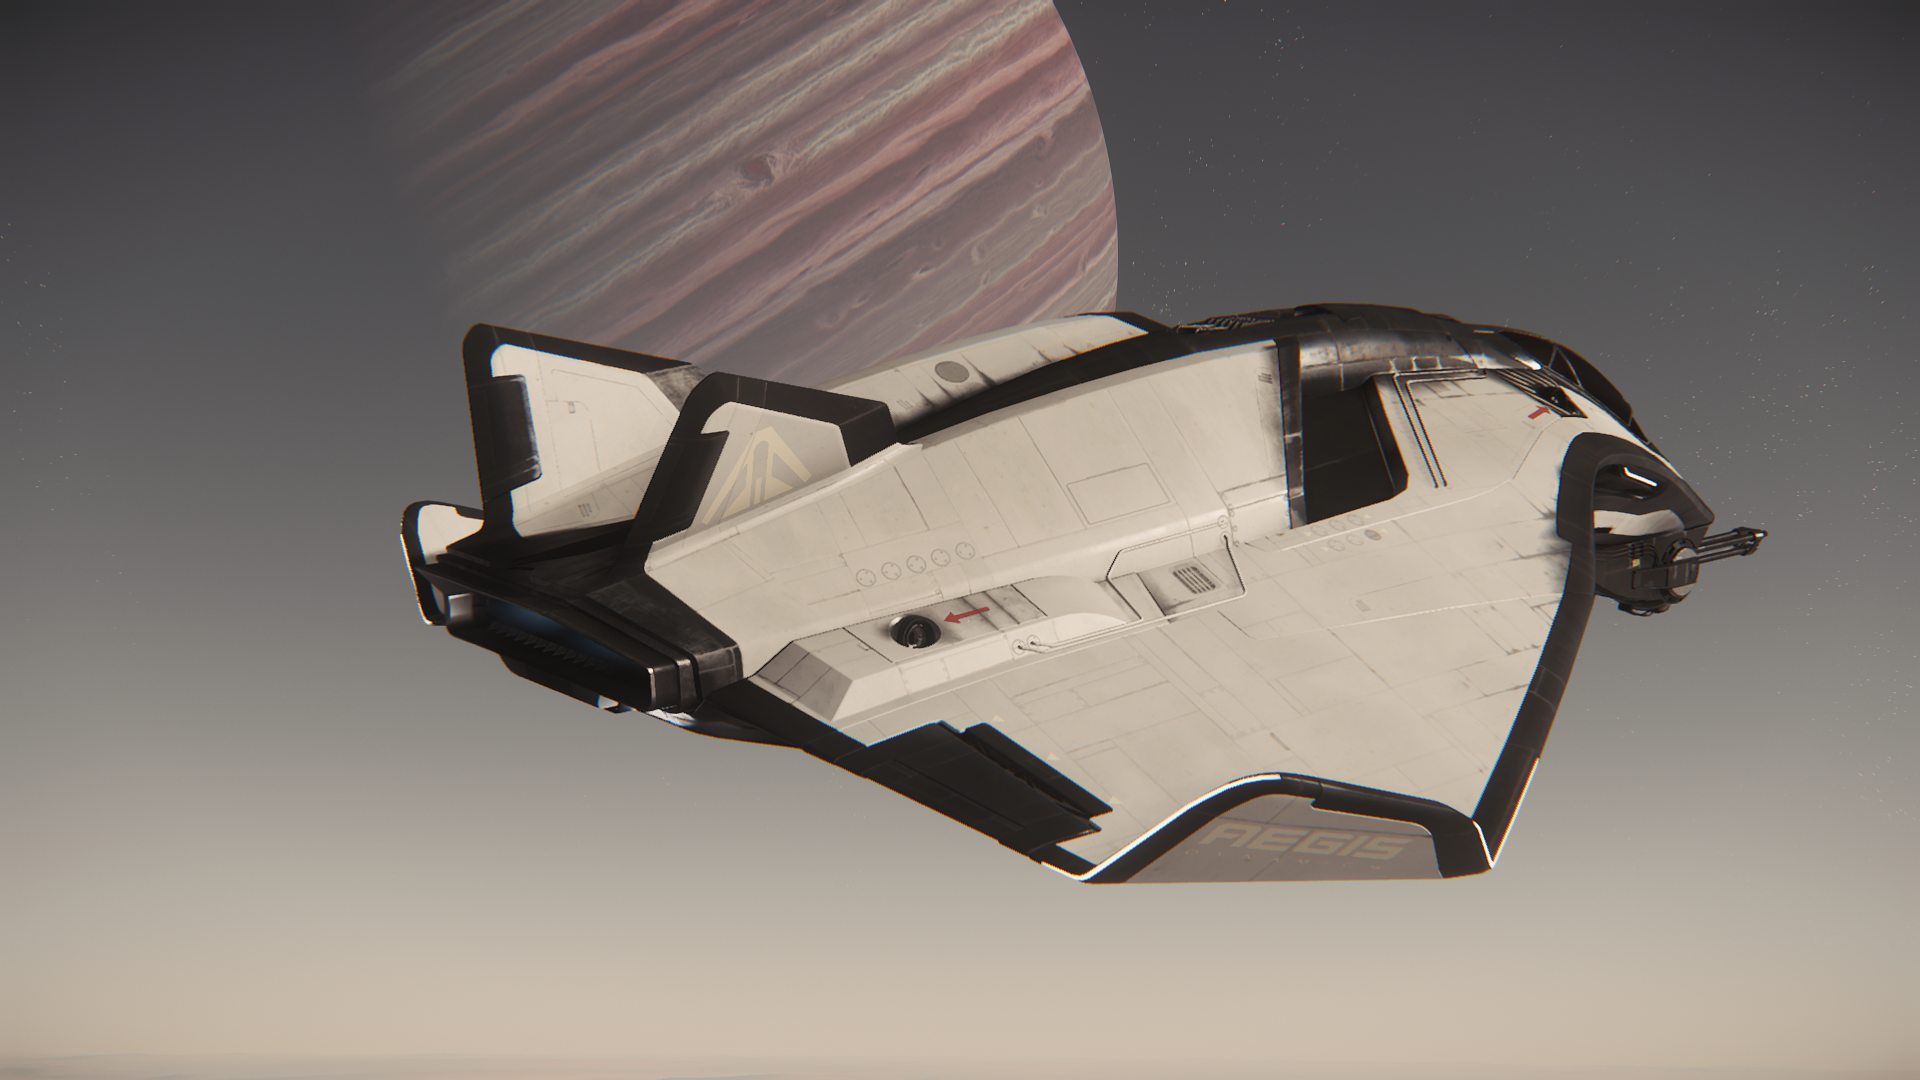 General 1920x1080 Star Citizen space science fiction Avenger Titan Space Simulator video games